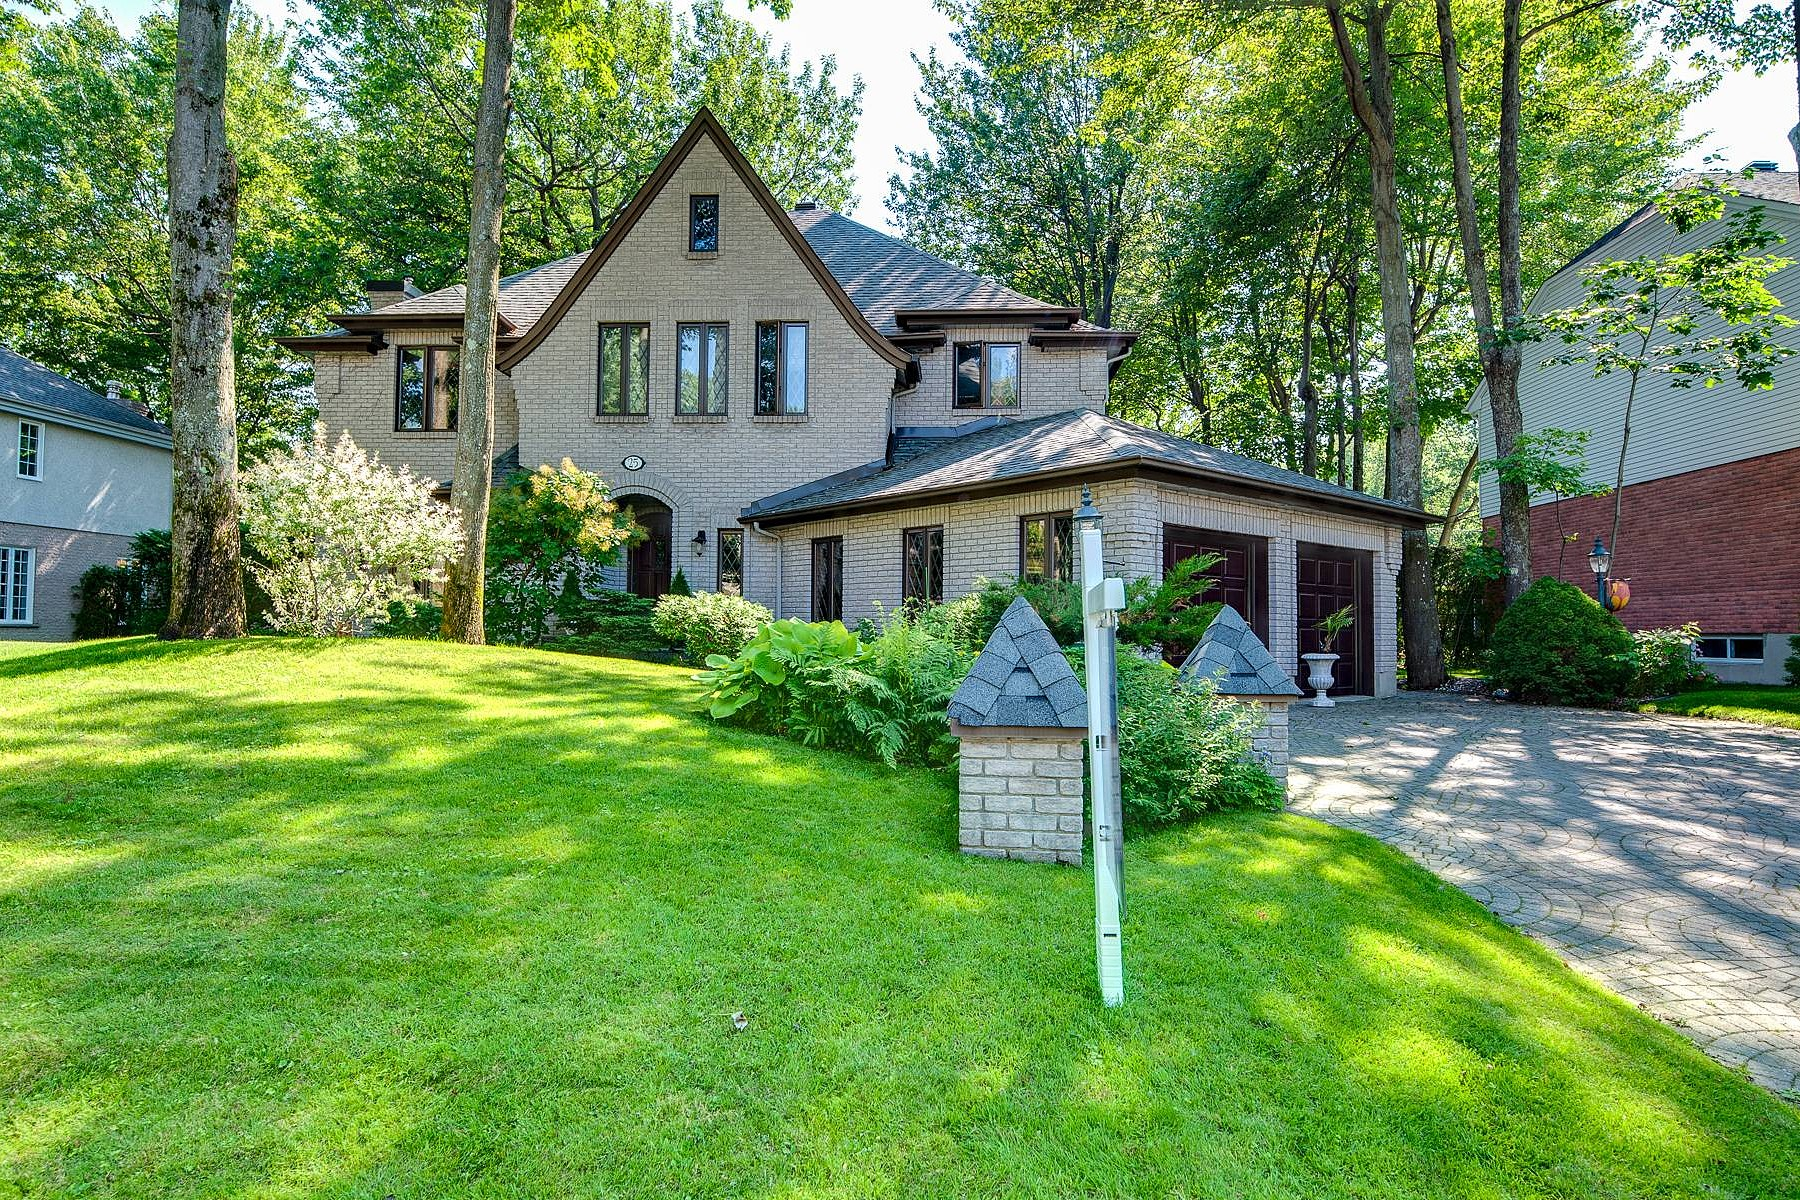 Single Family Homes for Sale at Sainte-Thérèse, Laurentides 25 Rue des Tilleuls Sainte-Therese, Quebec J7E5P6 Canada